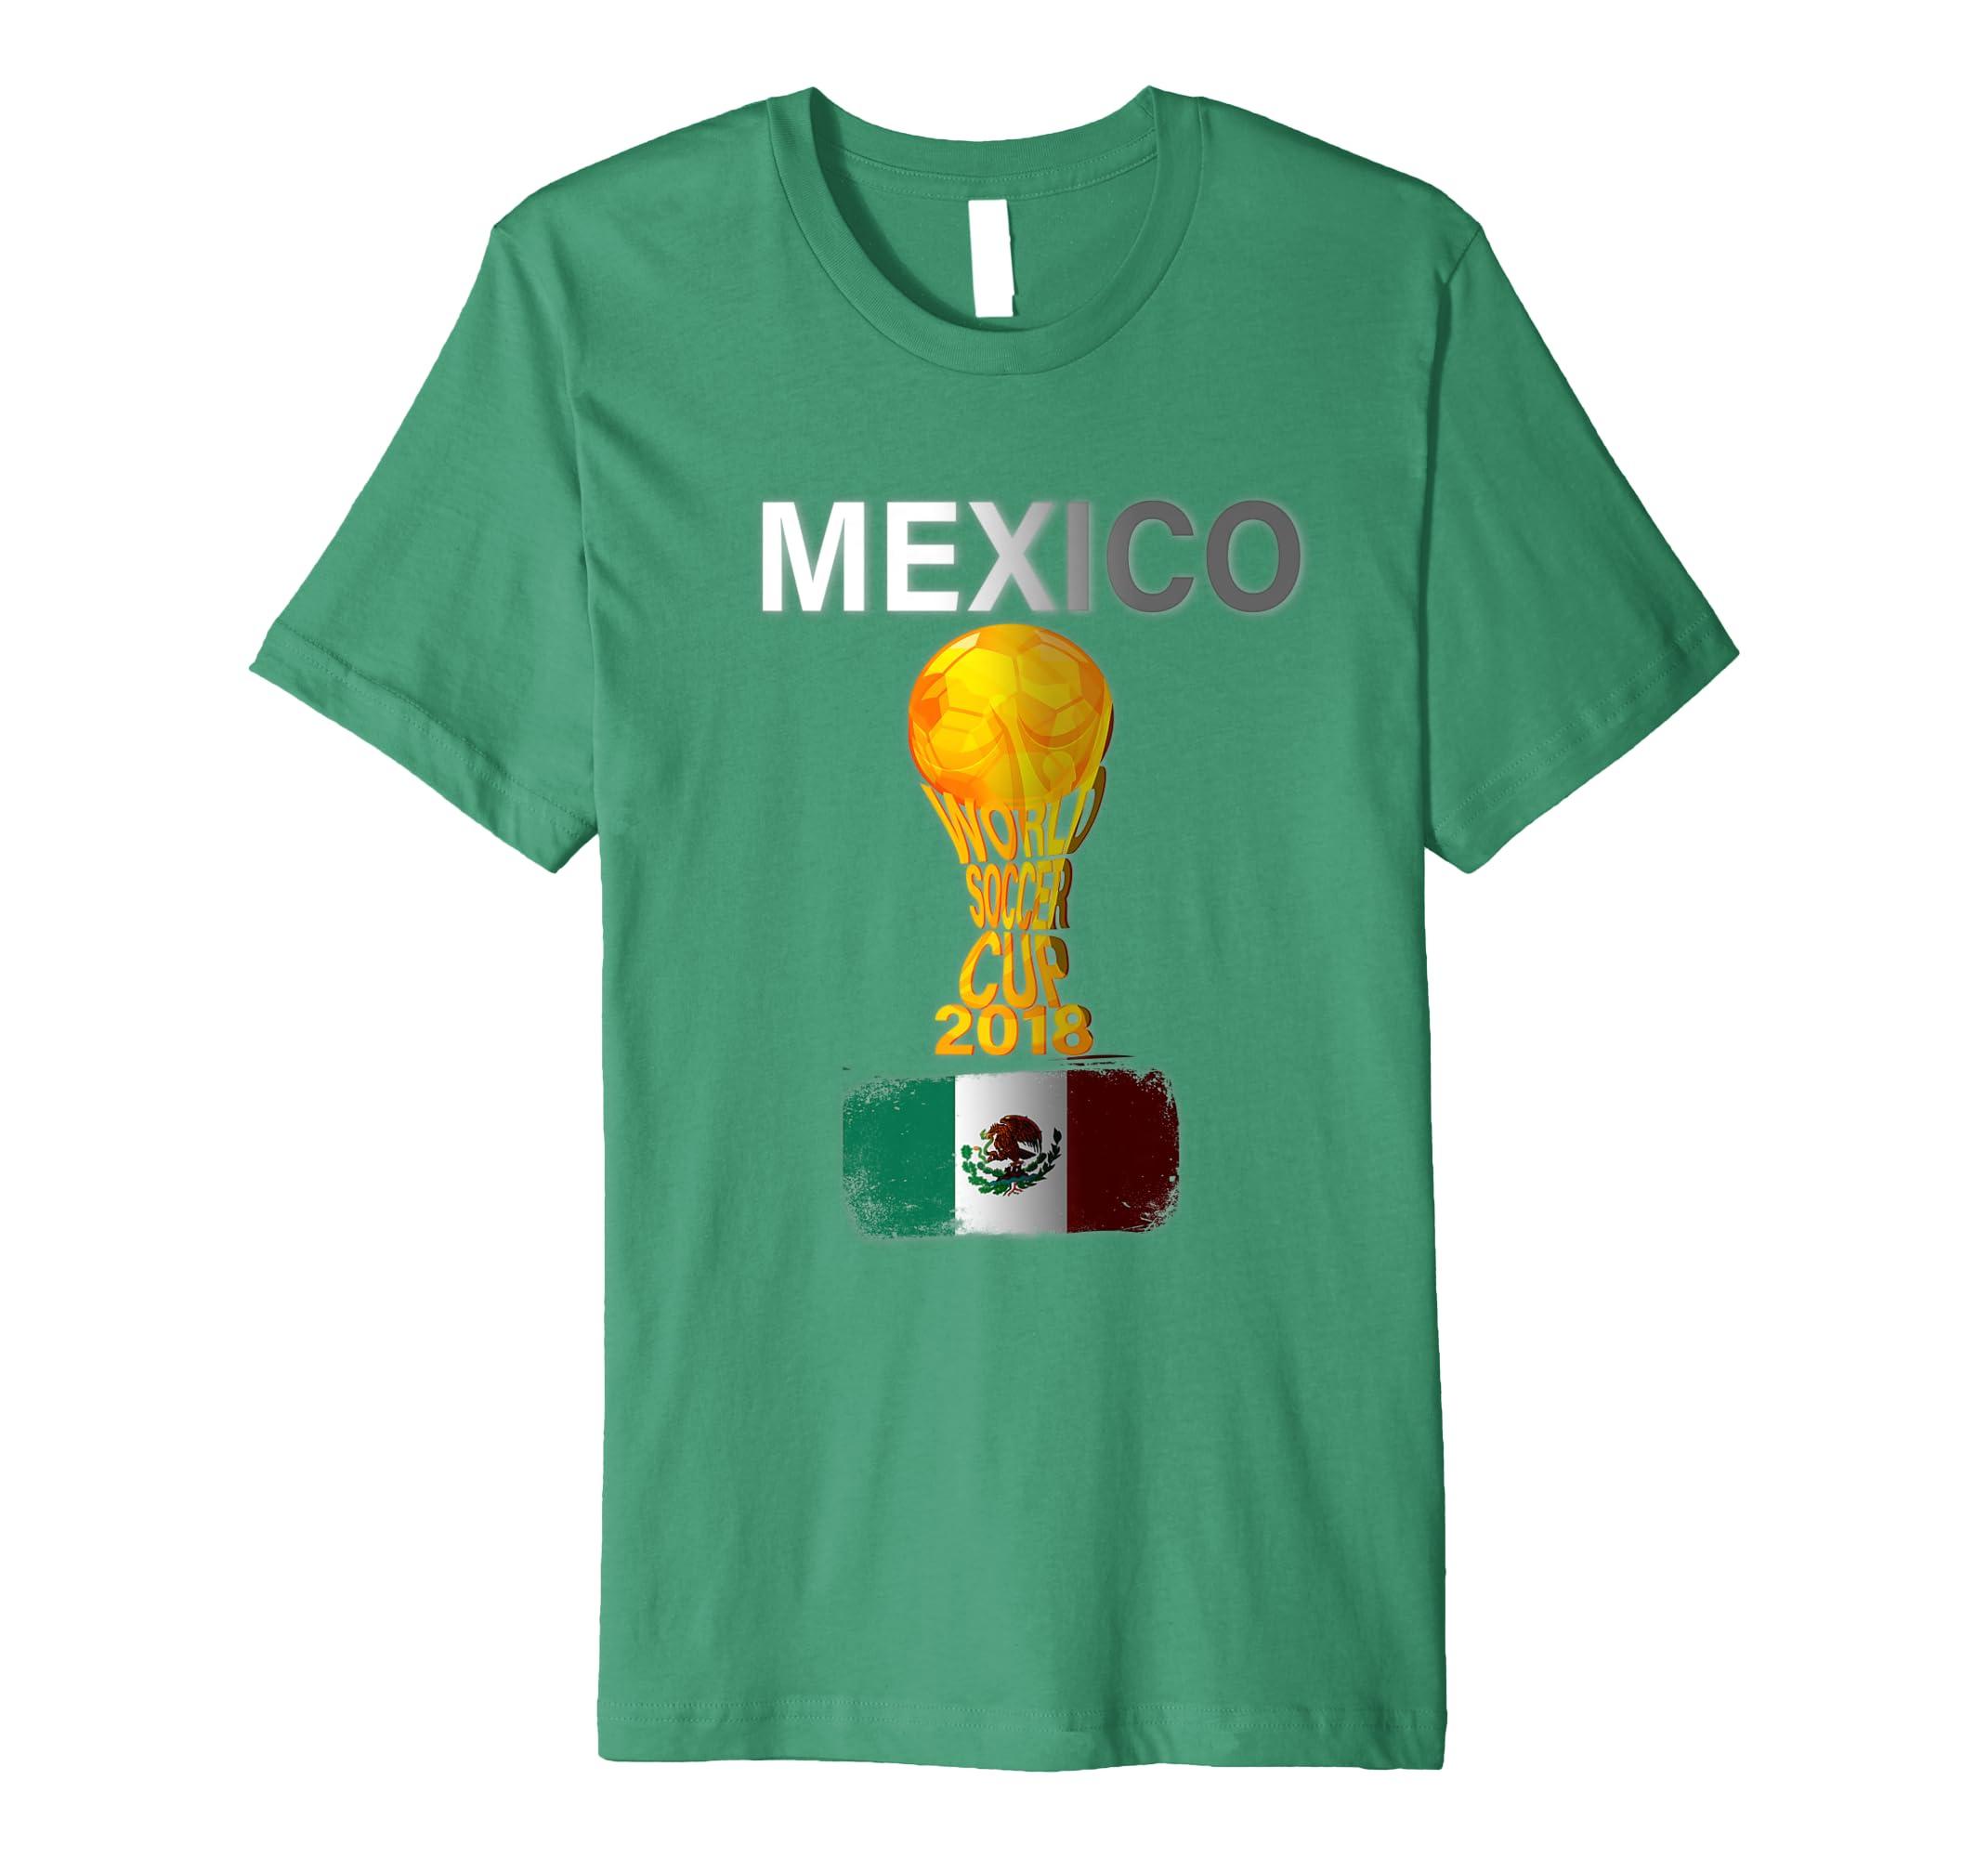 80b844d6a Mexico World Soccer Cup 2018 Fan Novelty Tshirt Men Women-prm ...